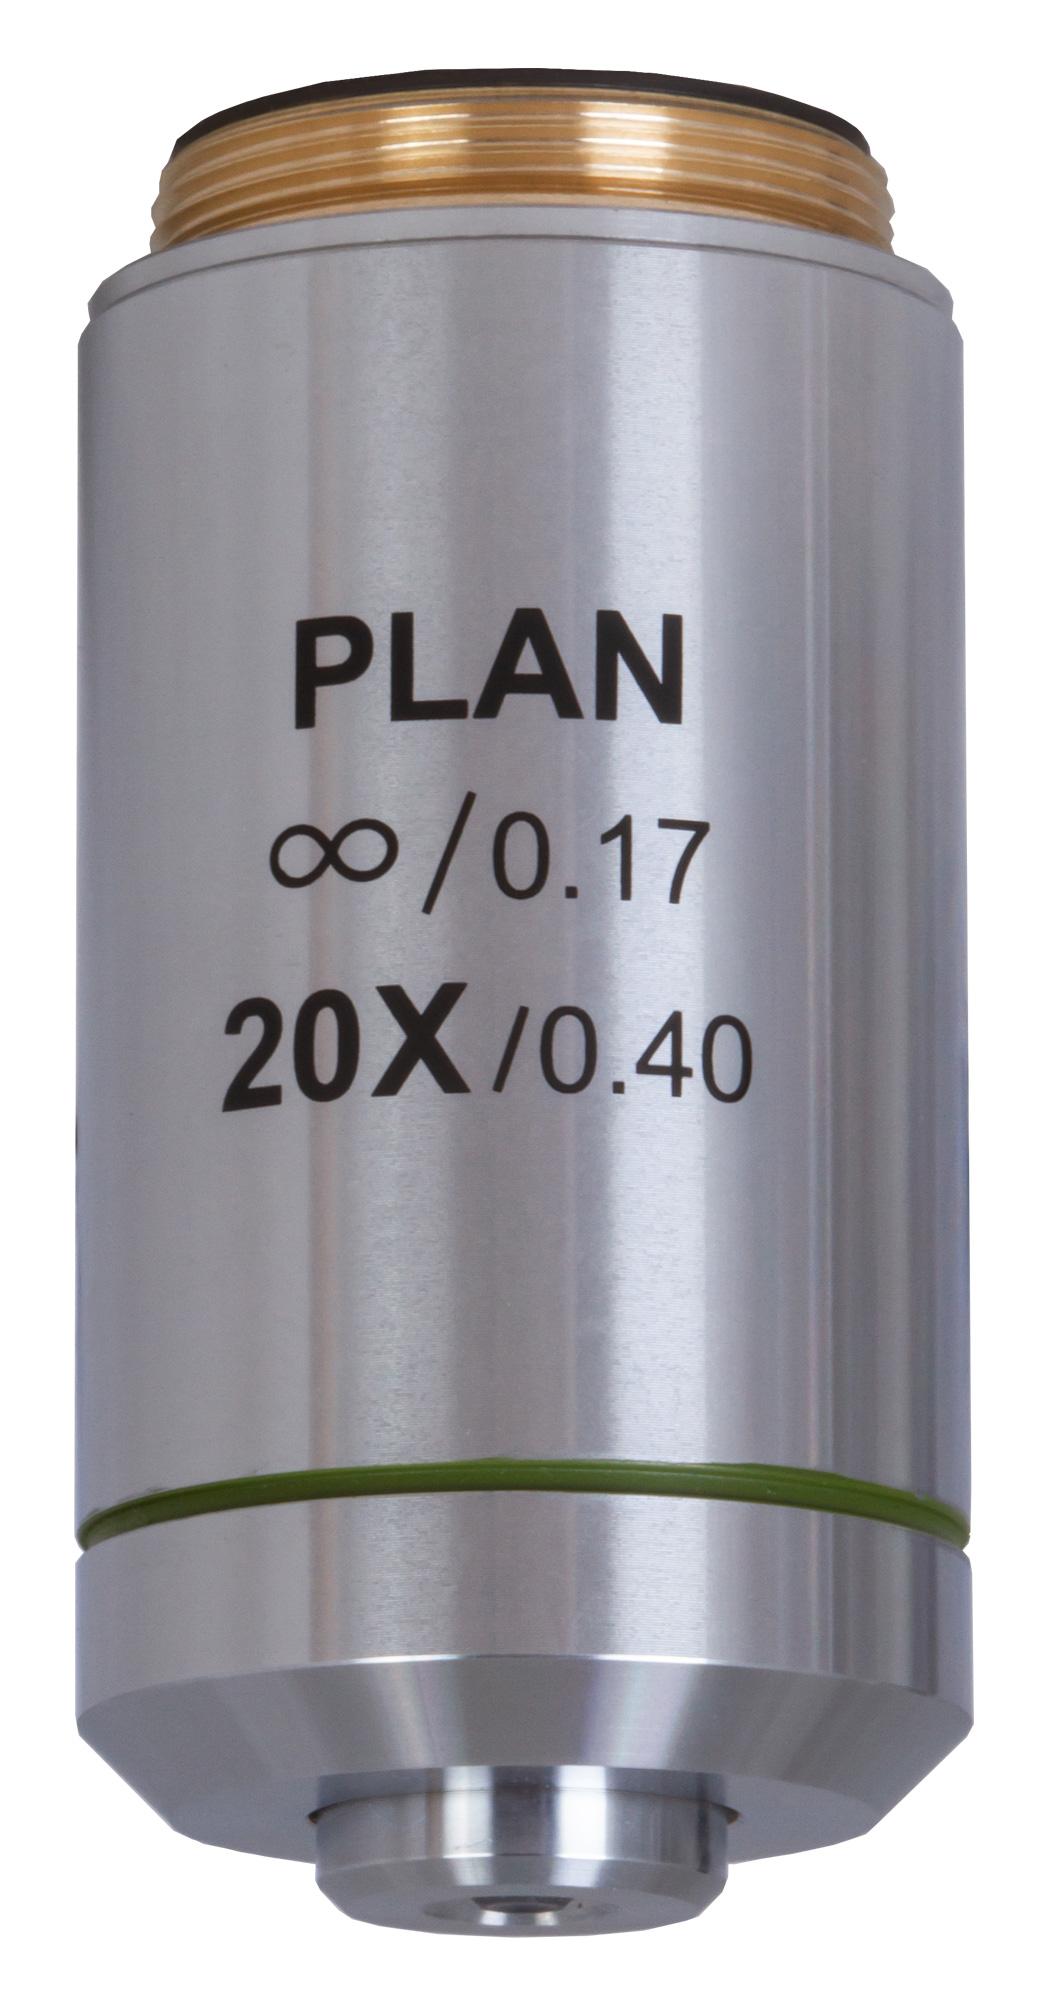 Картинка для Объектив планахроматический Levenhuk (Левенгук) MED 20x/беск